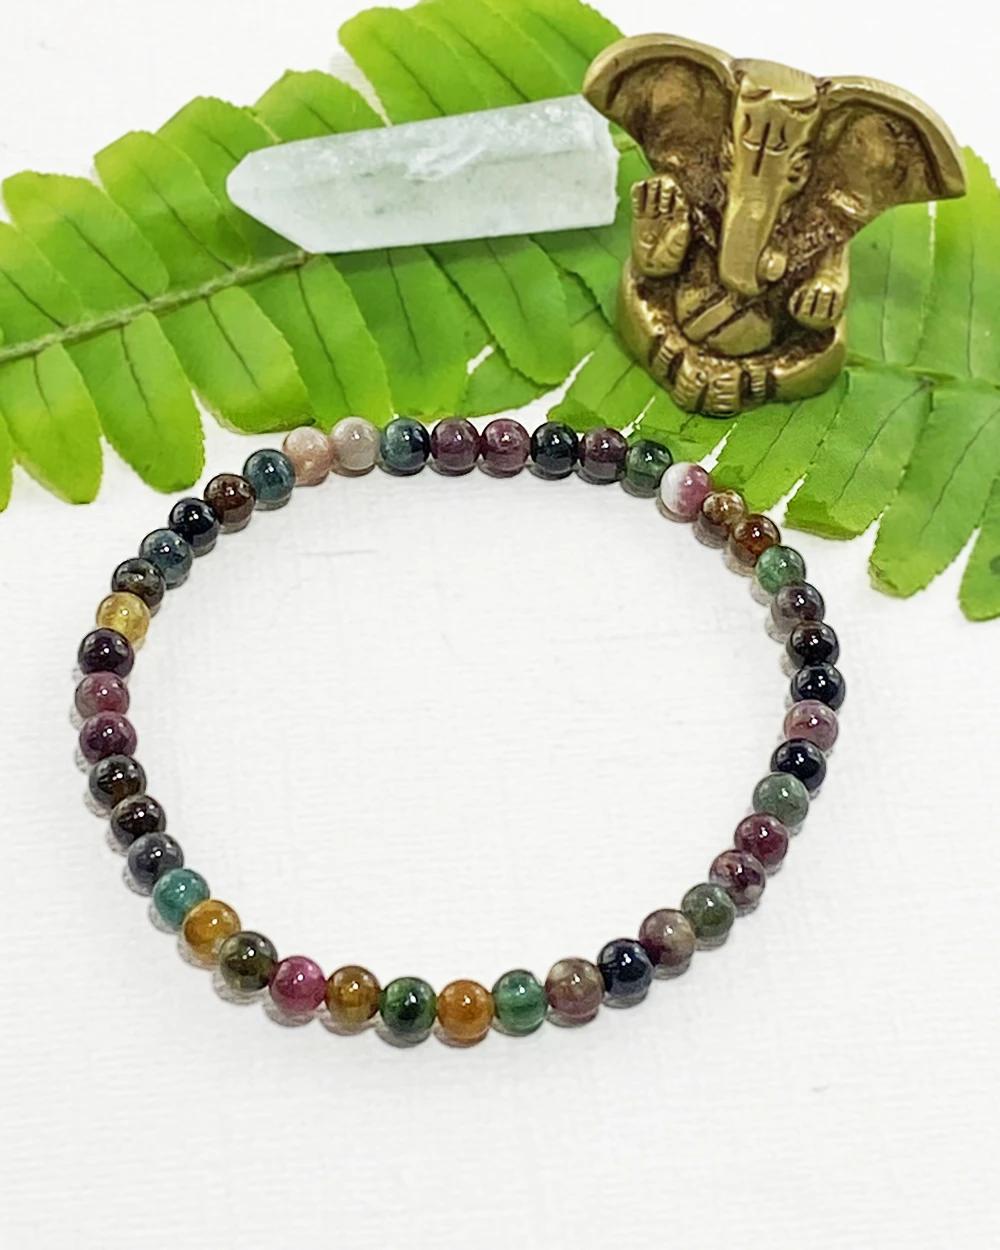 Tourmaline Mini Gemstone Energy Bracelet In 2020 Gemstones Energy Energy Bracelets Gemstones